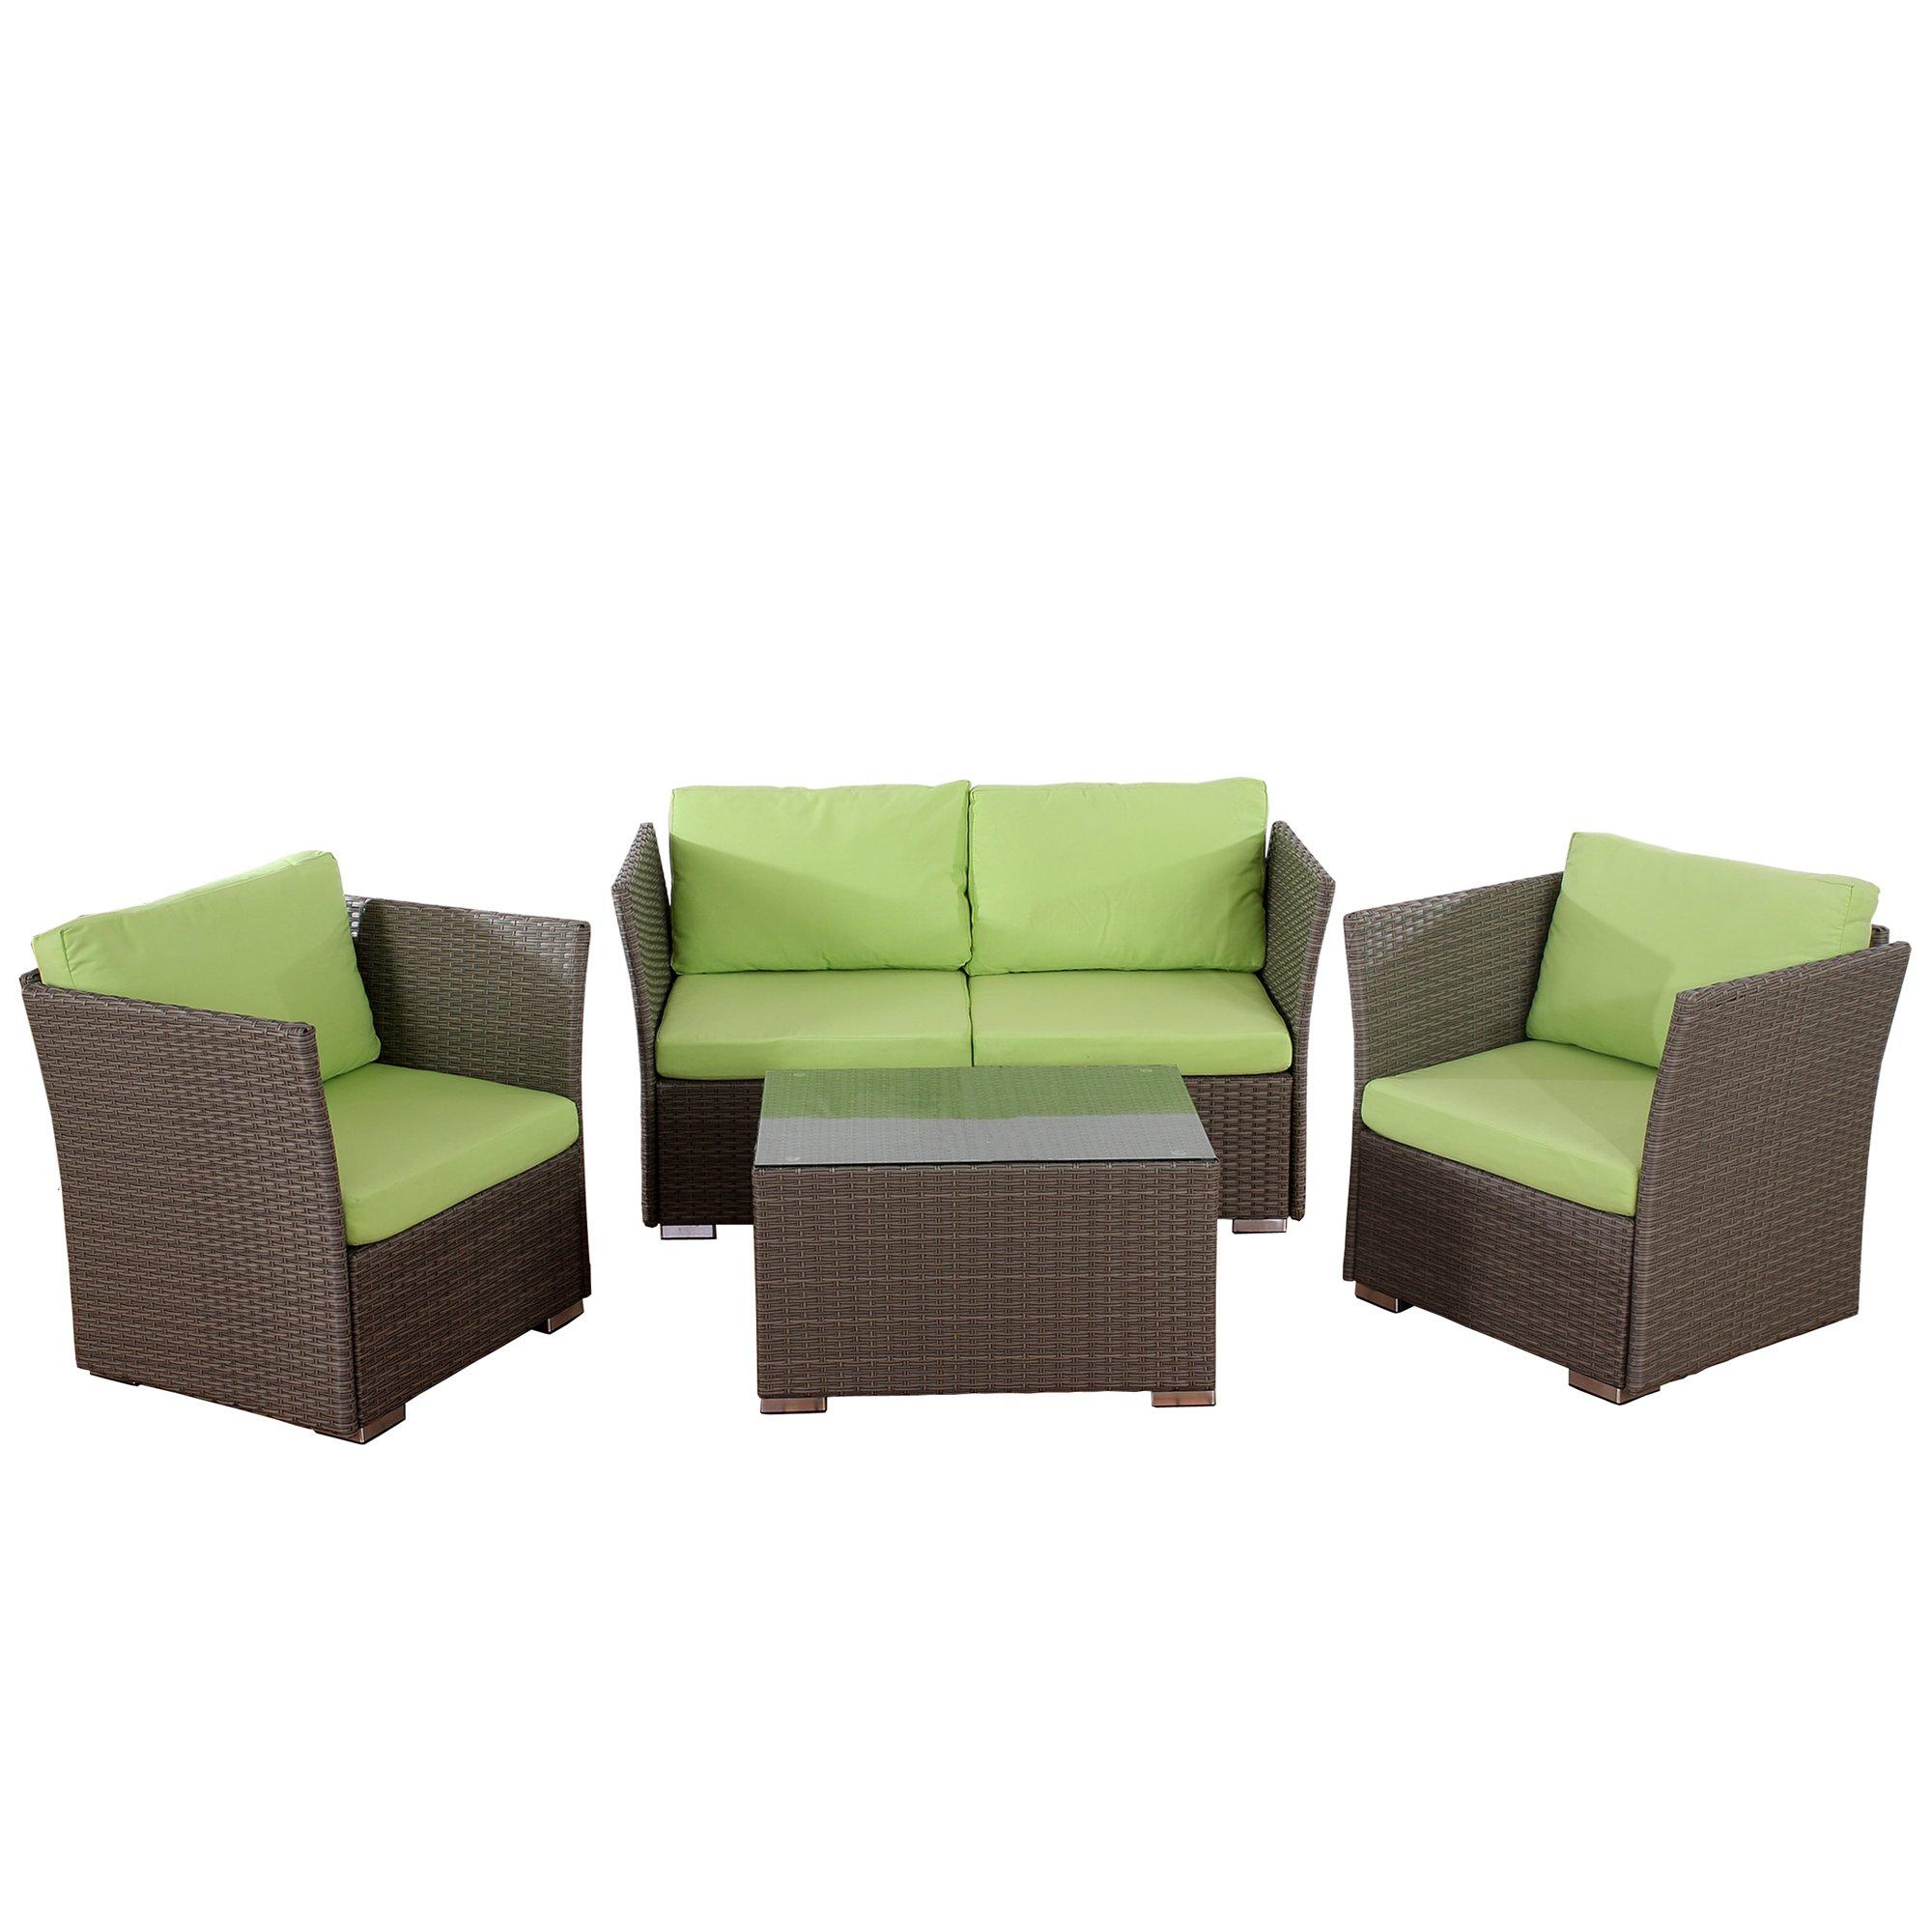 Conjunto de jardin siena sofa 2 sillones mesa for Cojines jardin